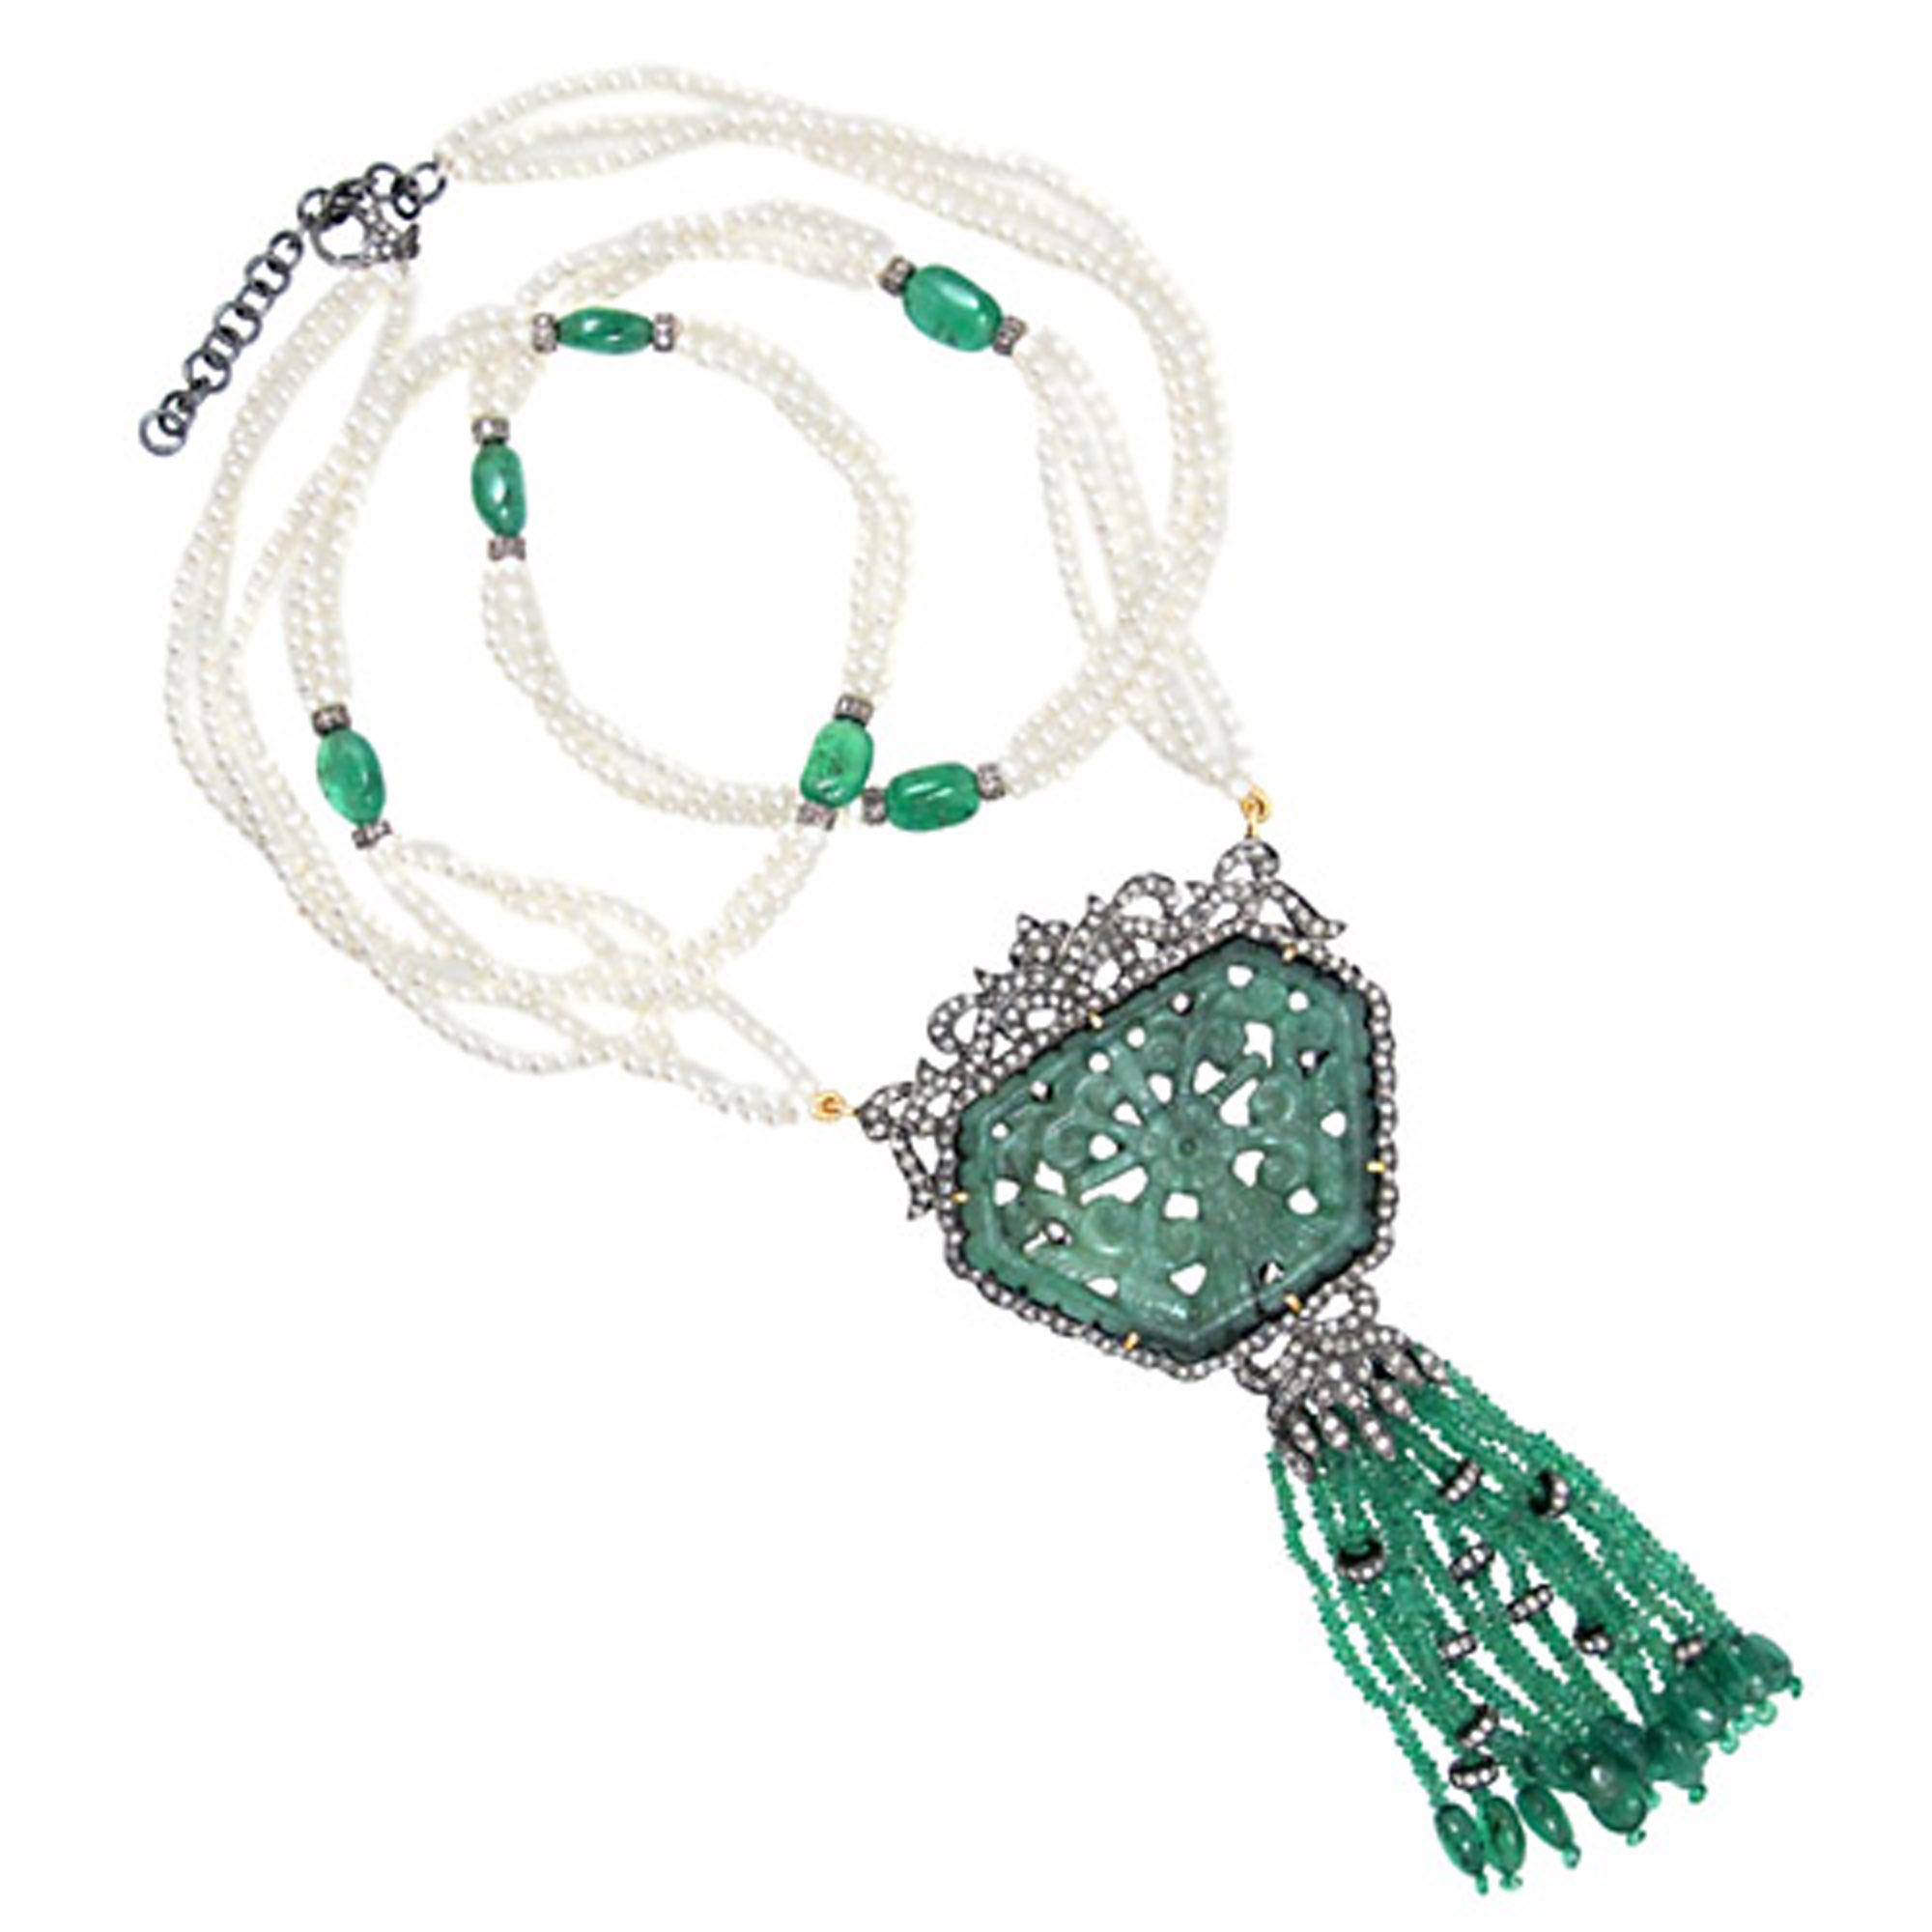 Natural gemstone emerald carving pendant pearl tassel necklace